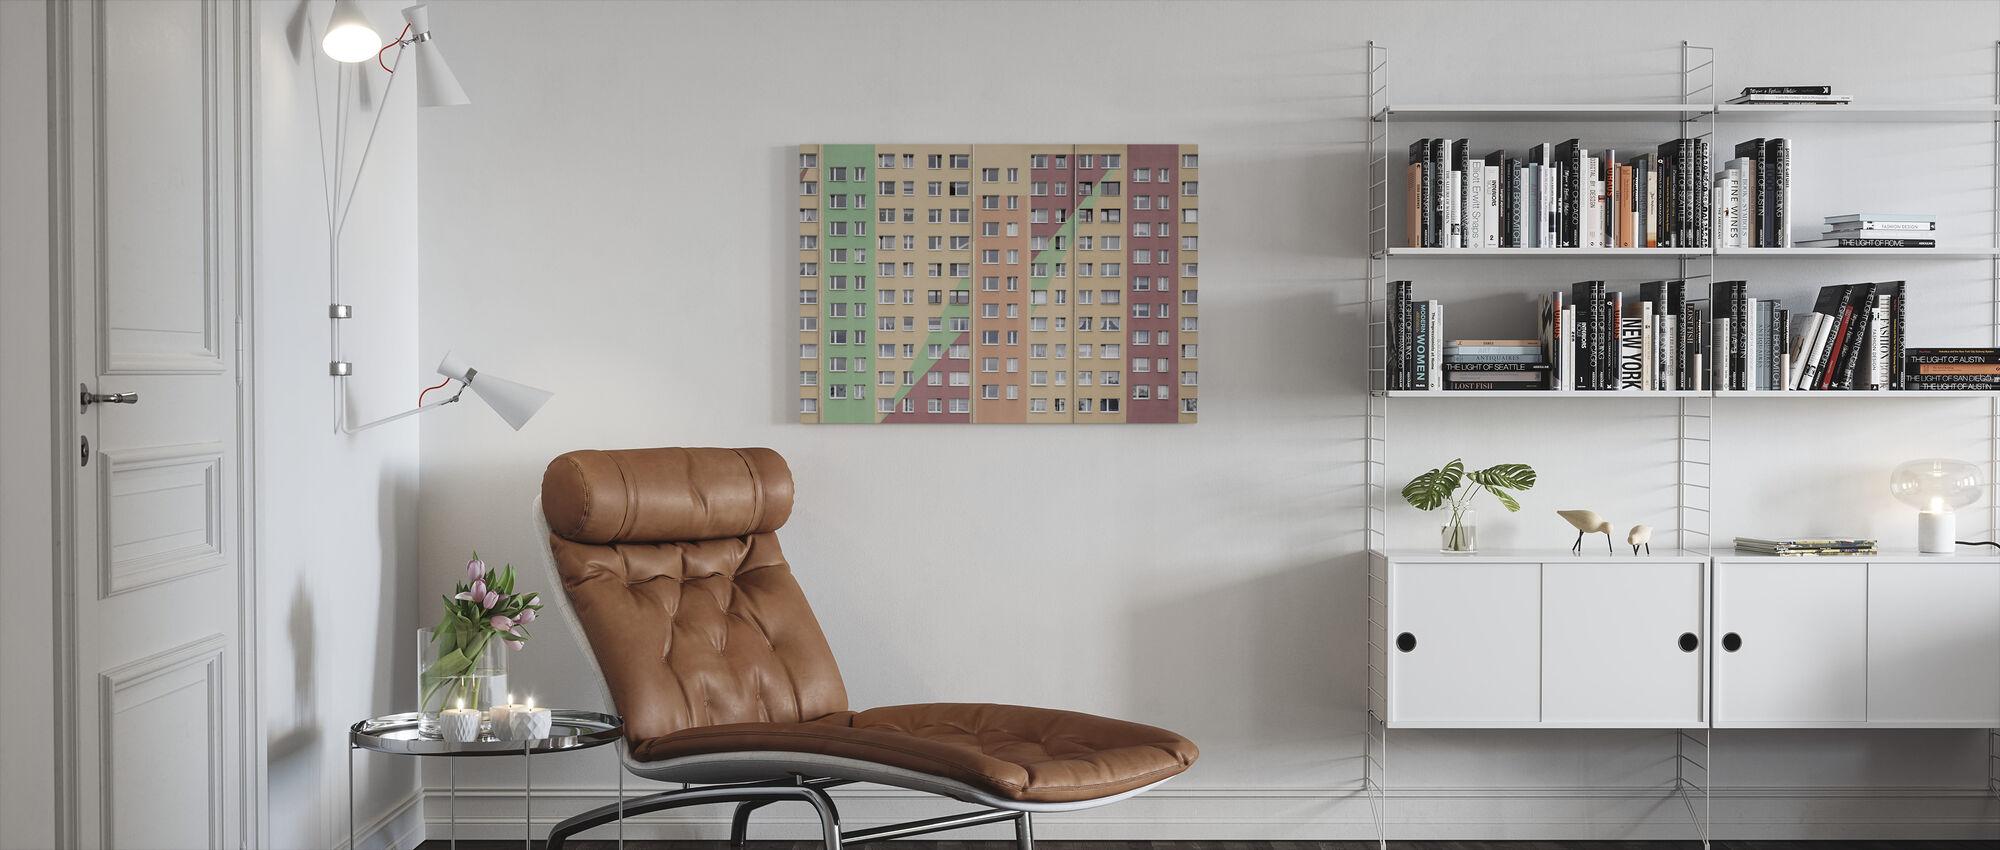 Apartment Windows - Canvas print - Living Room